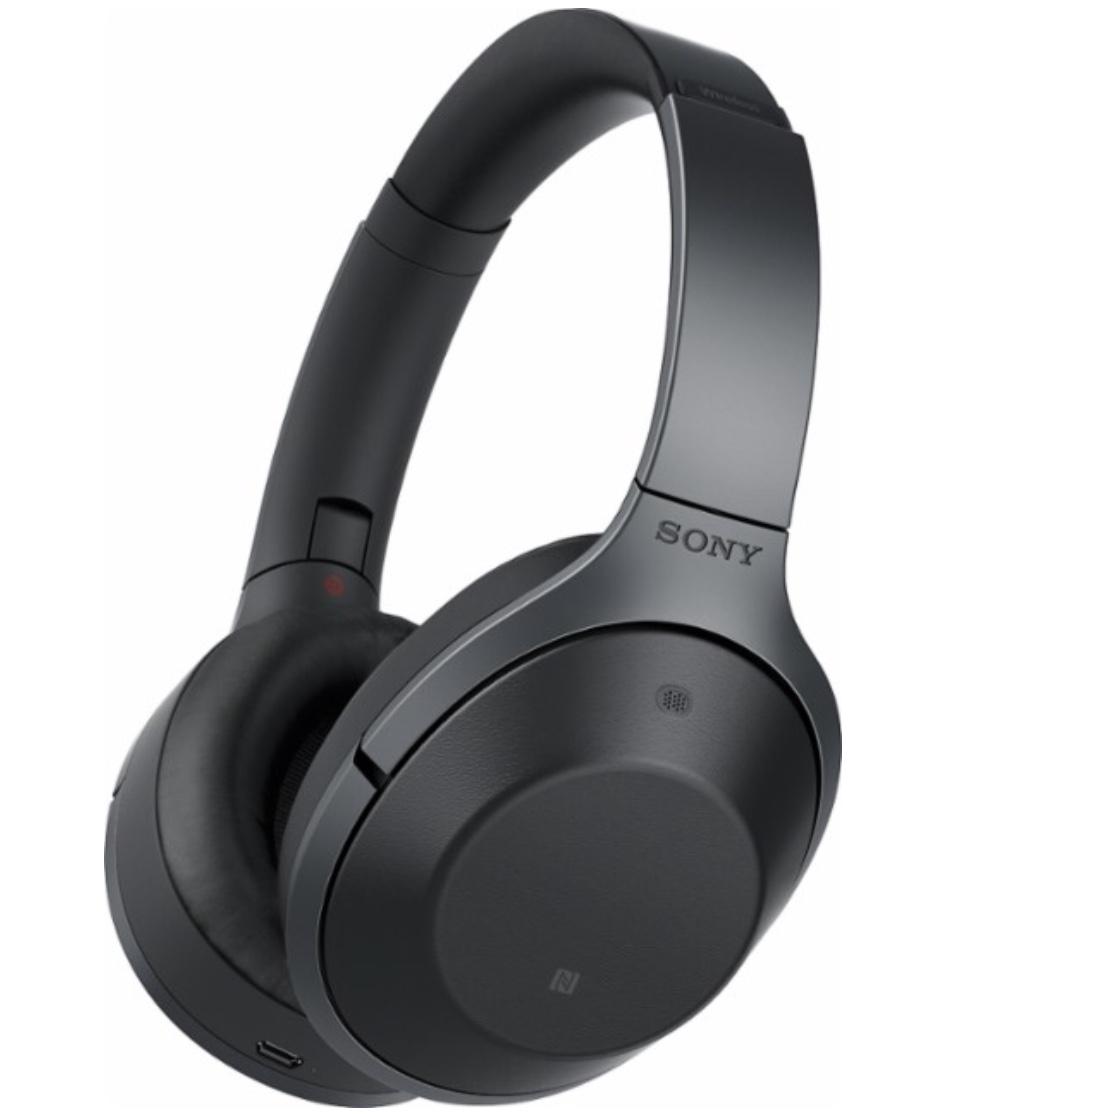 Sony 1000x Wireless Noise Cancelling Headphone $228.99